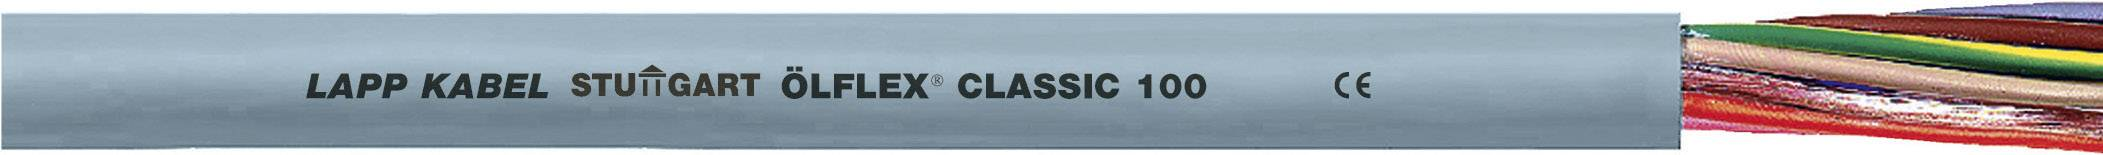 Kabel LappKabel Ölflex CLASSIC 100 3X1,5 (00101284), PVC, 6,7 mm, 500 V, šedá, 1000 m